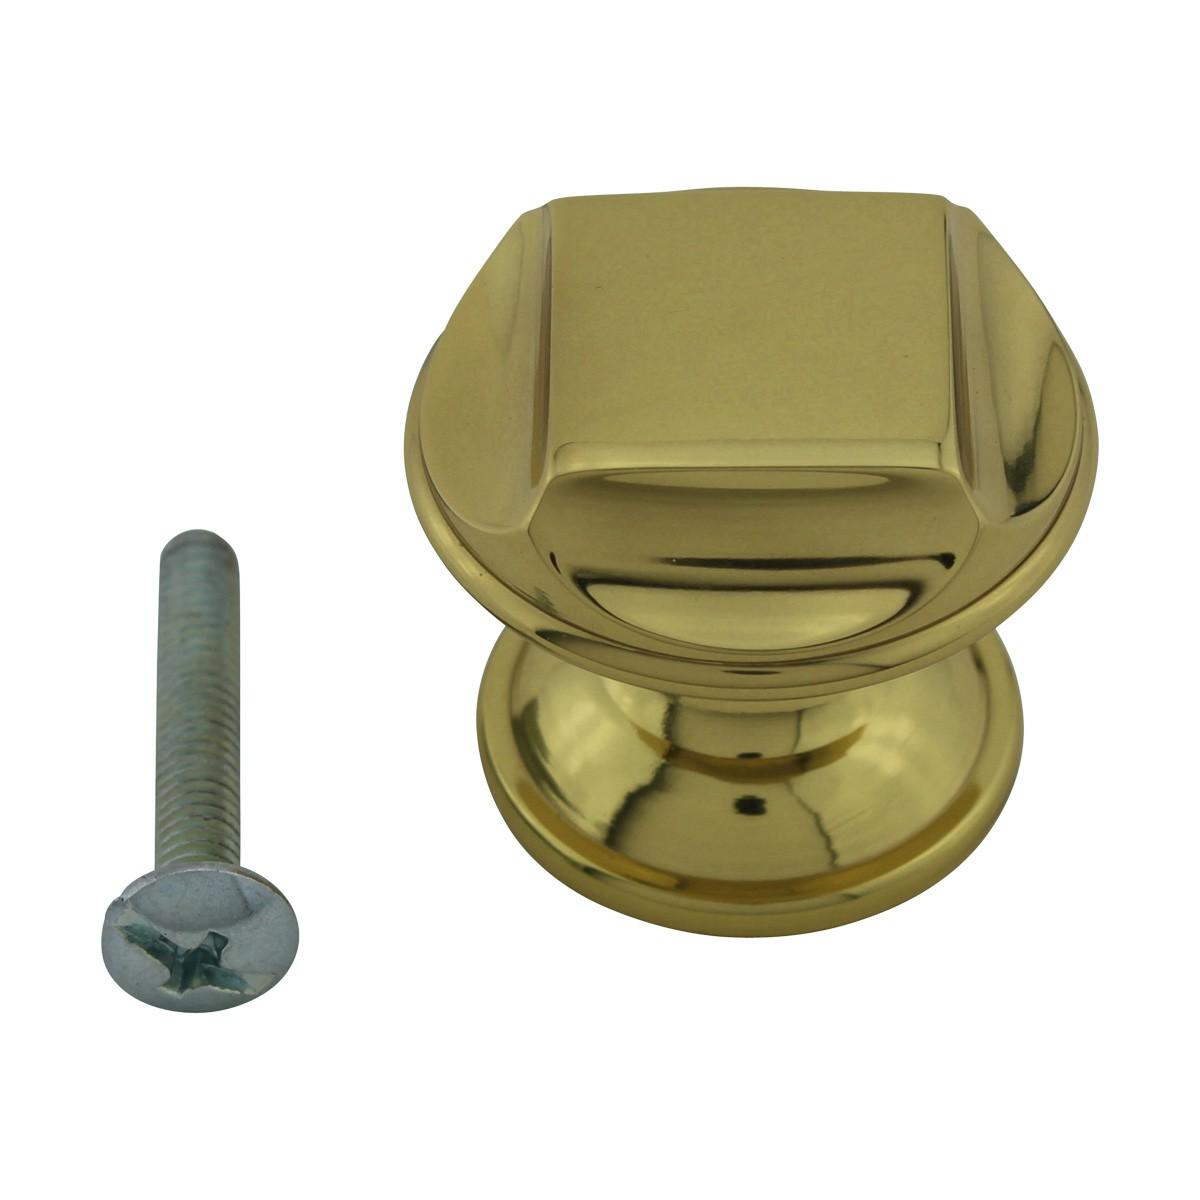 6 Cabinet Knob Bright Solid Brass 1 14 Dia Cabinet Hardware Cabinet Knobs Cabinet Knob